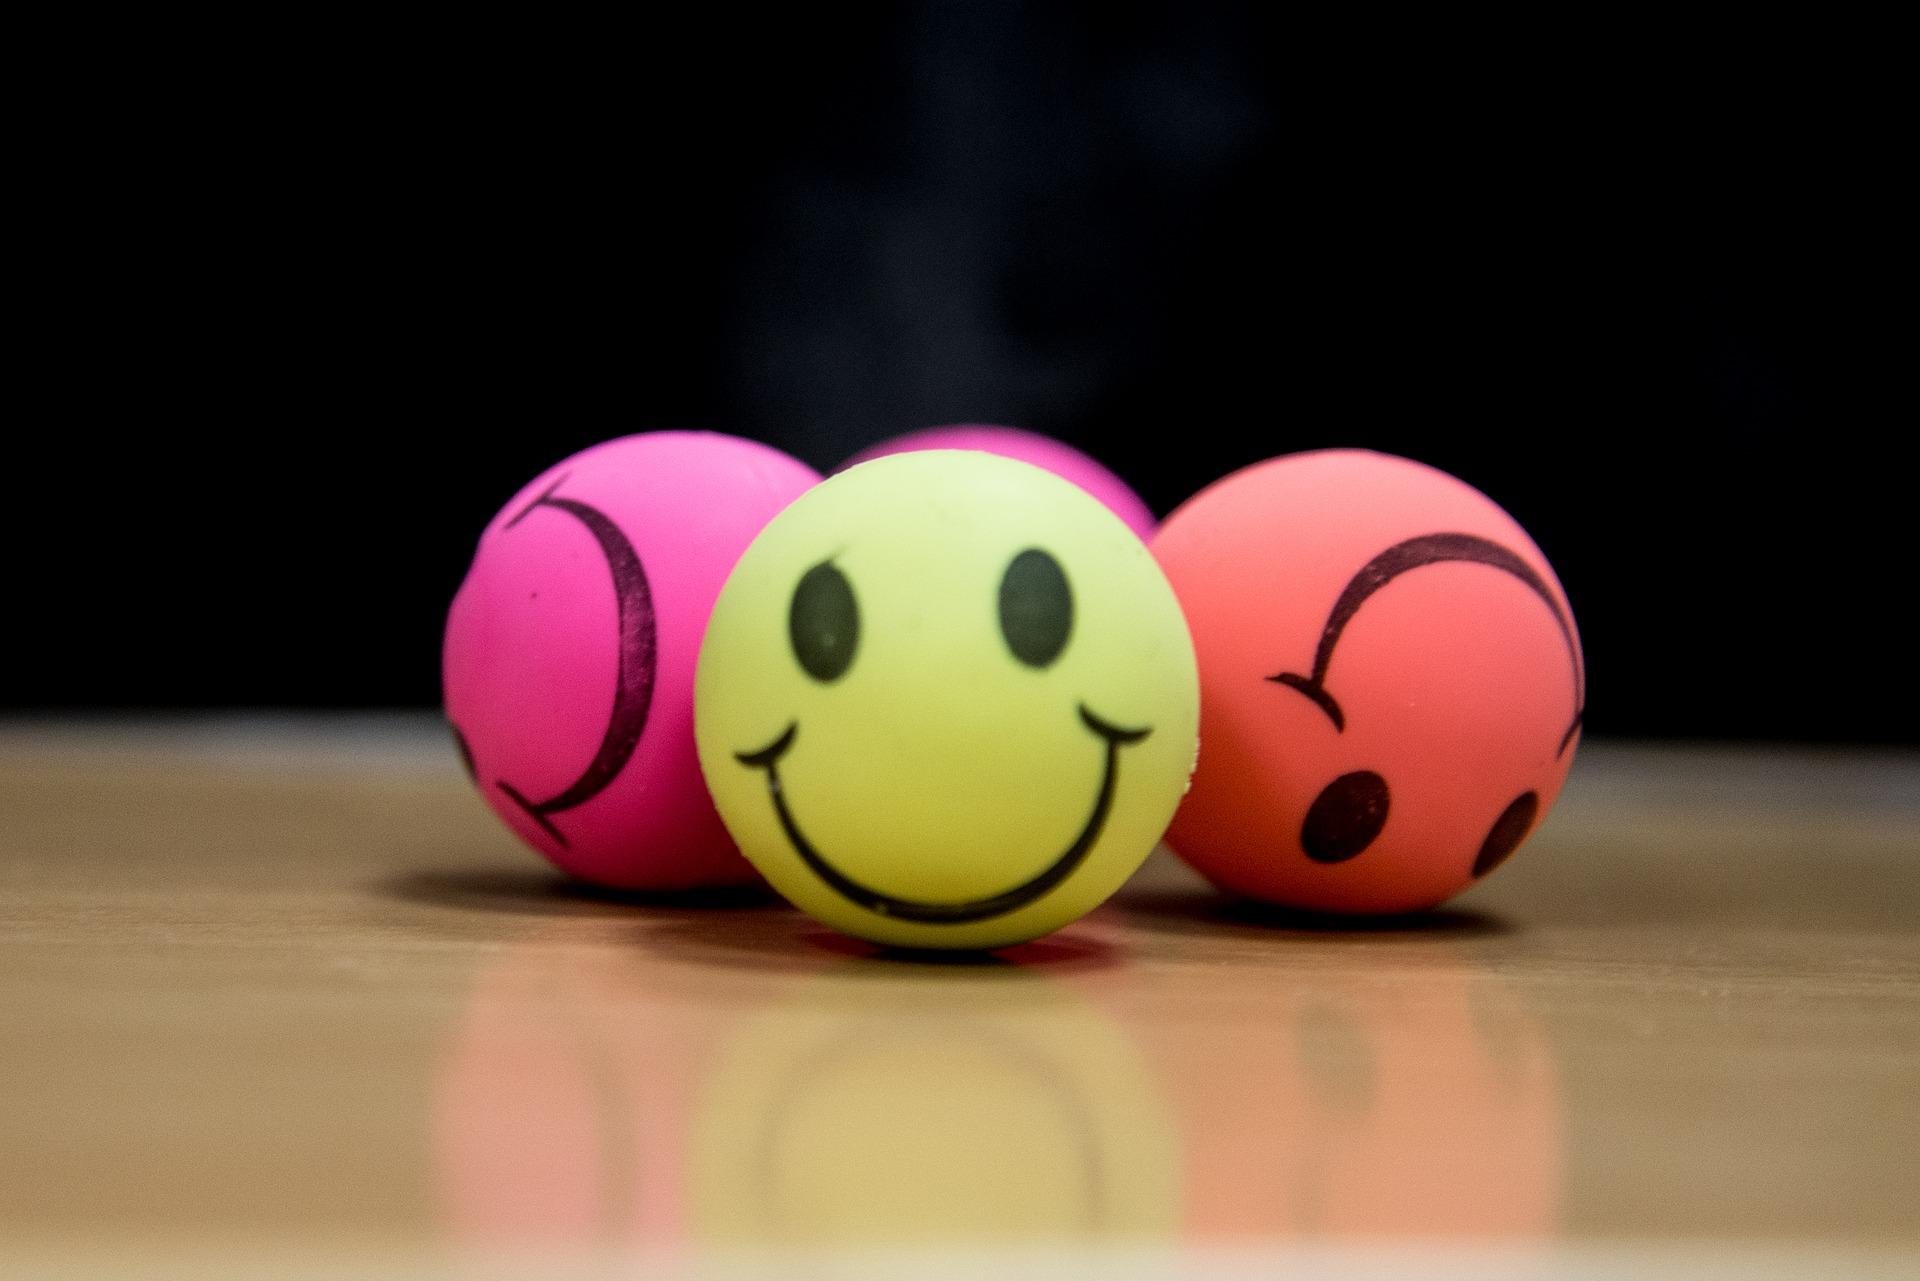 colorful stress balls